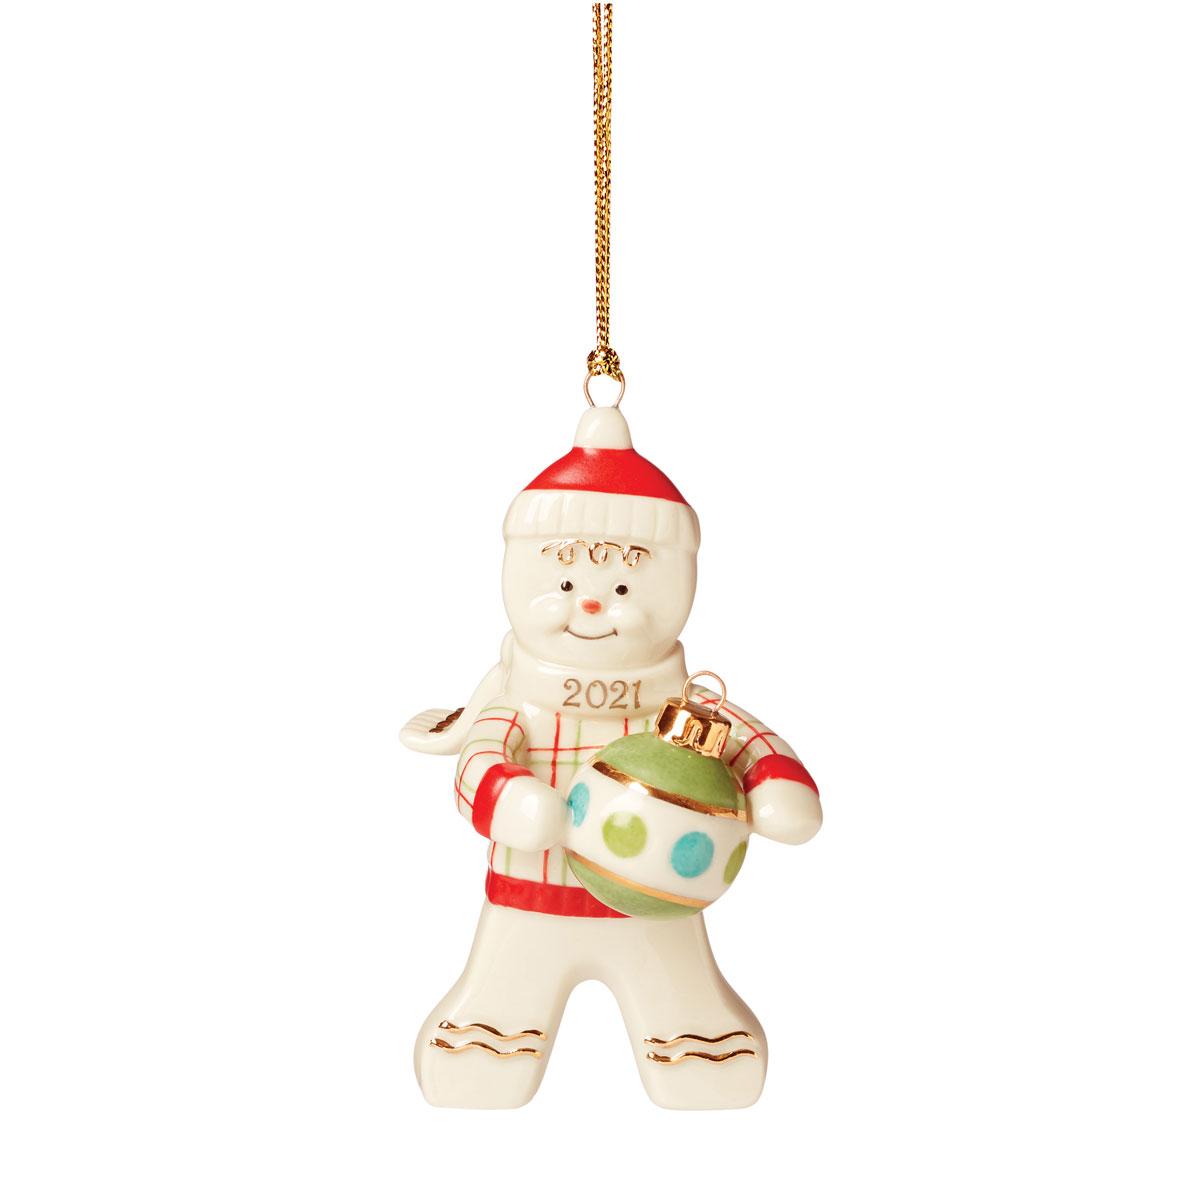 Lenox 2021 Trimming the Tree Gingerbread Ornament